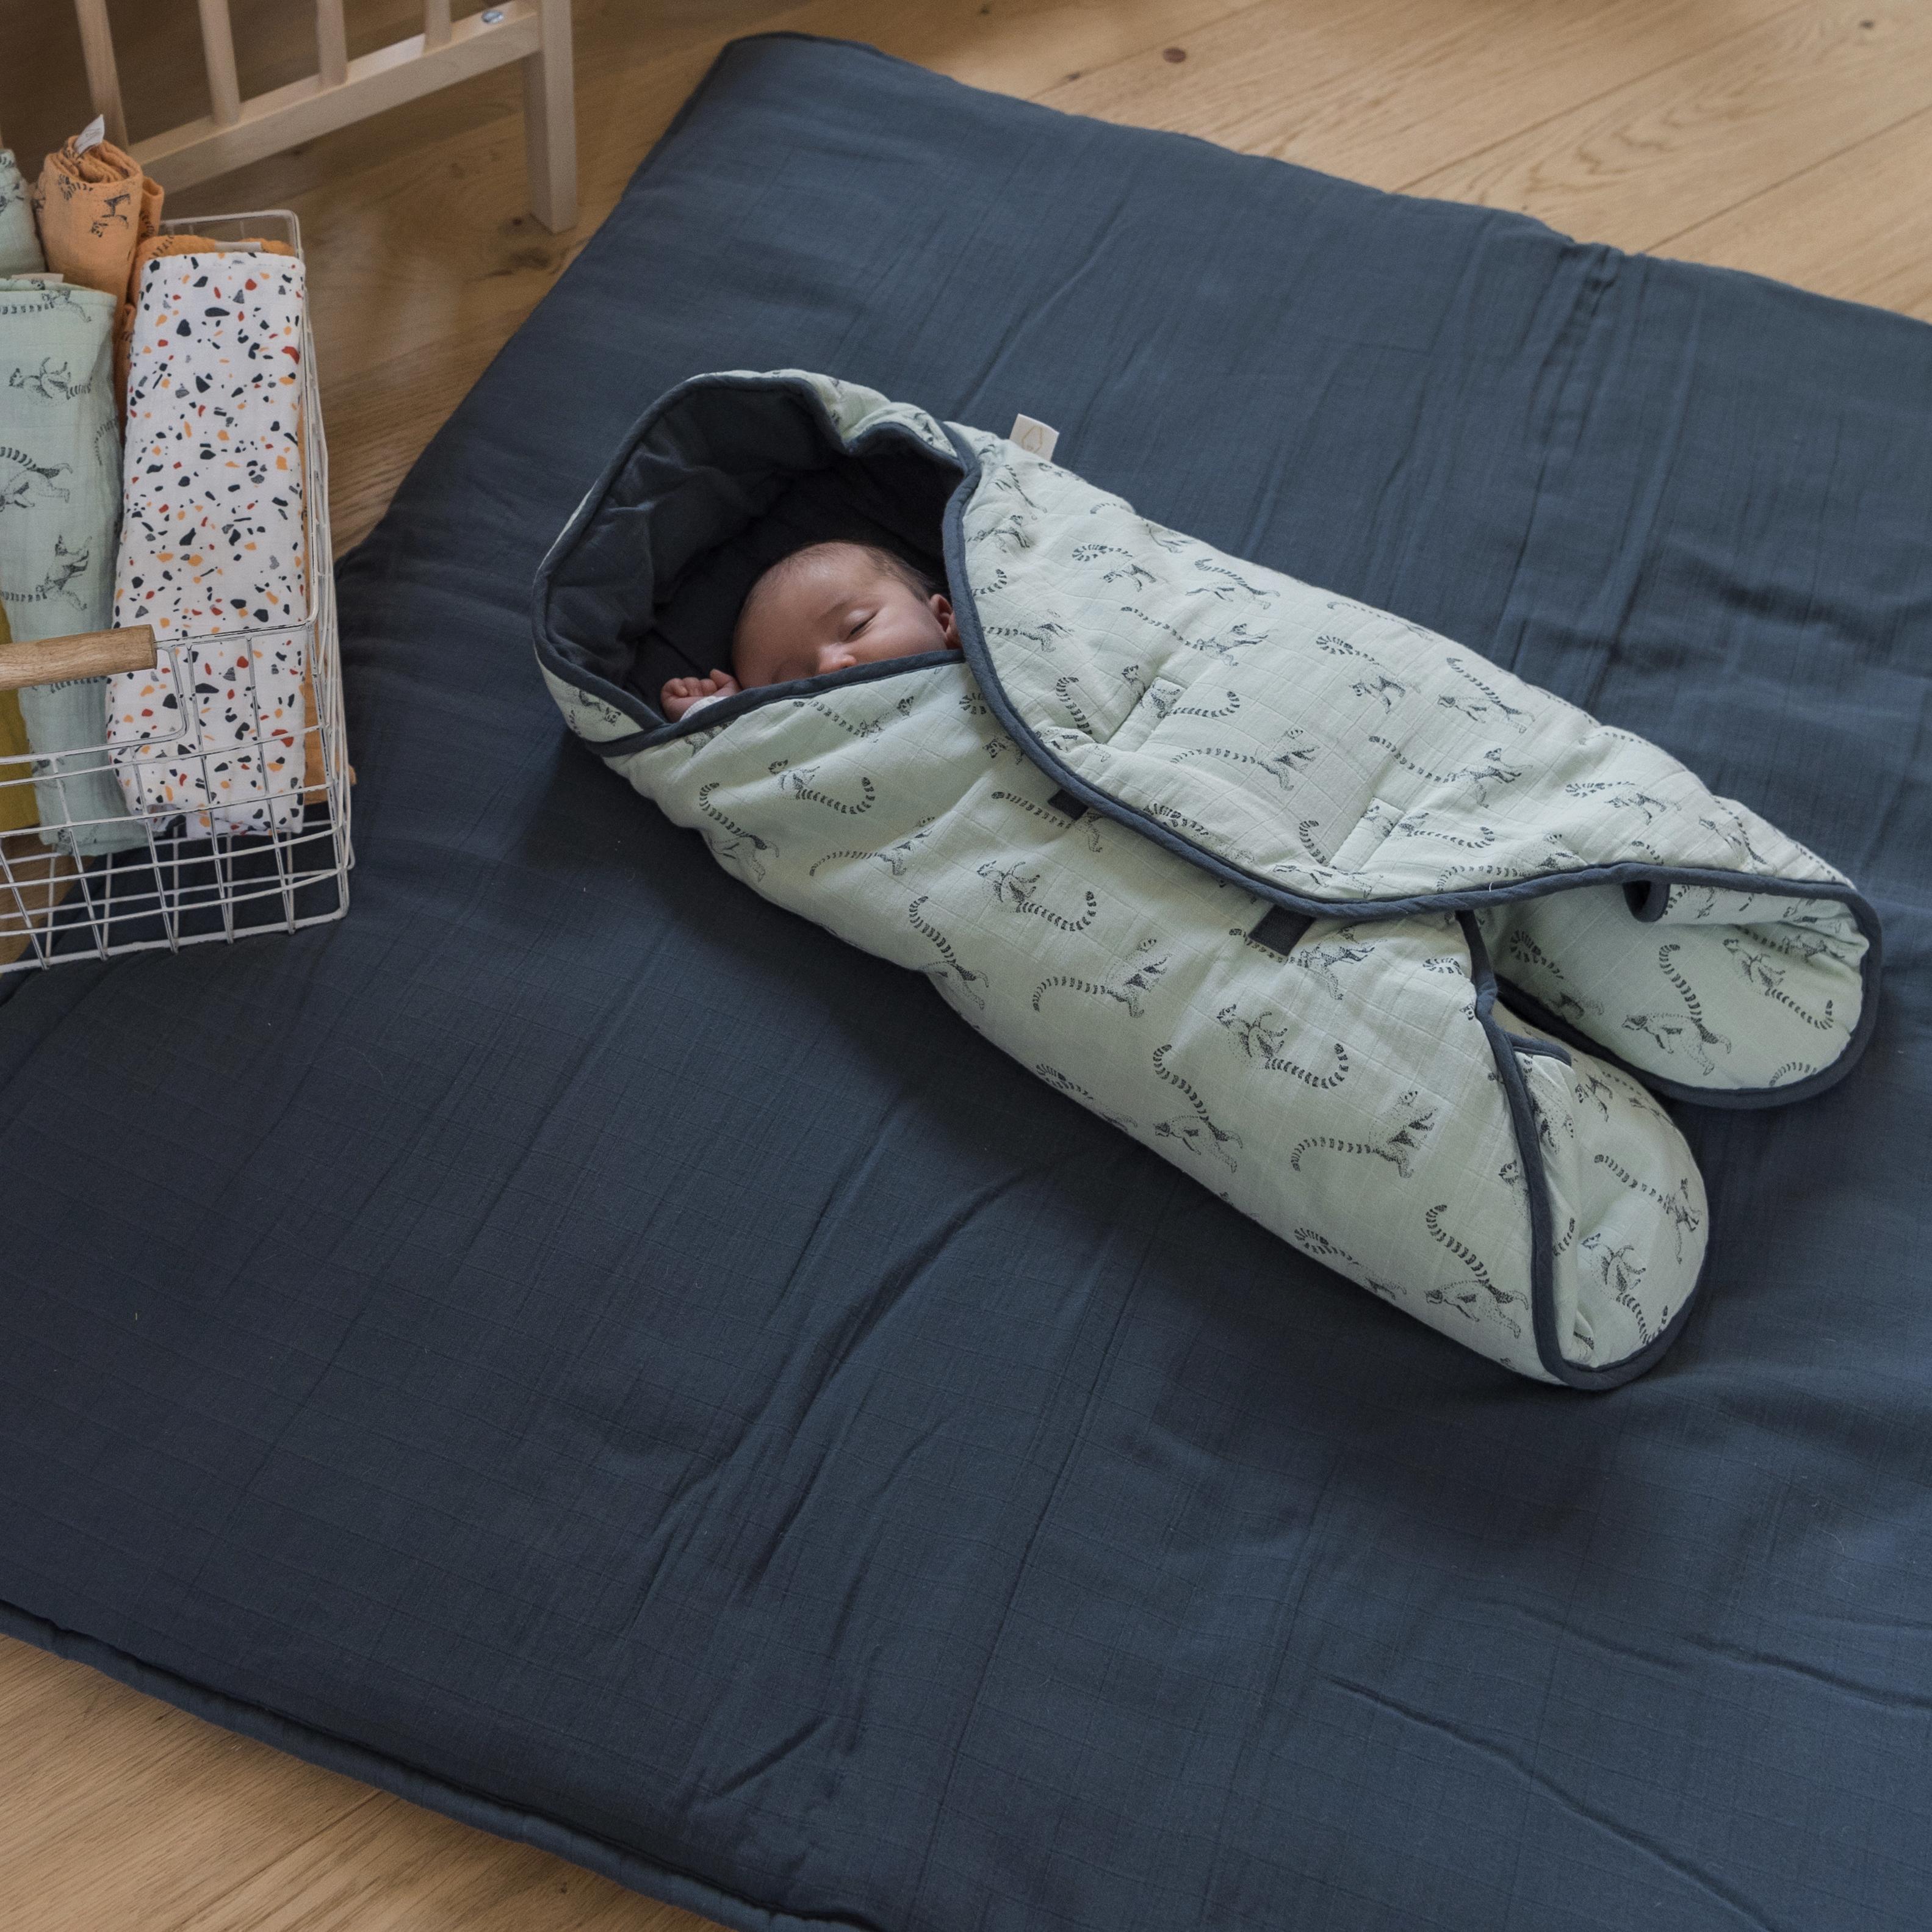 Princess warmly wrapped in the nomadic blanket Milinane